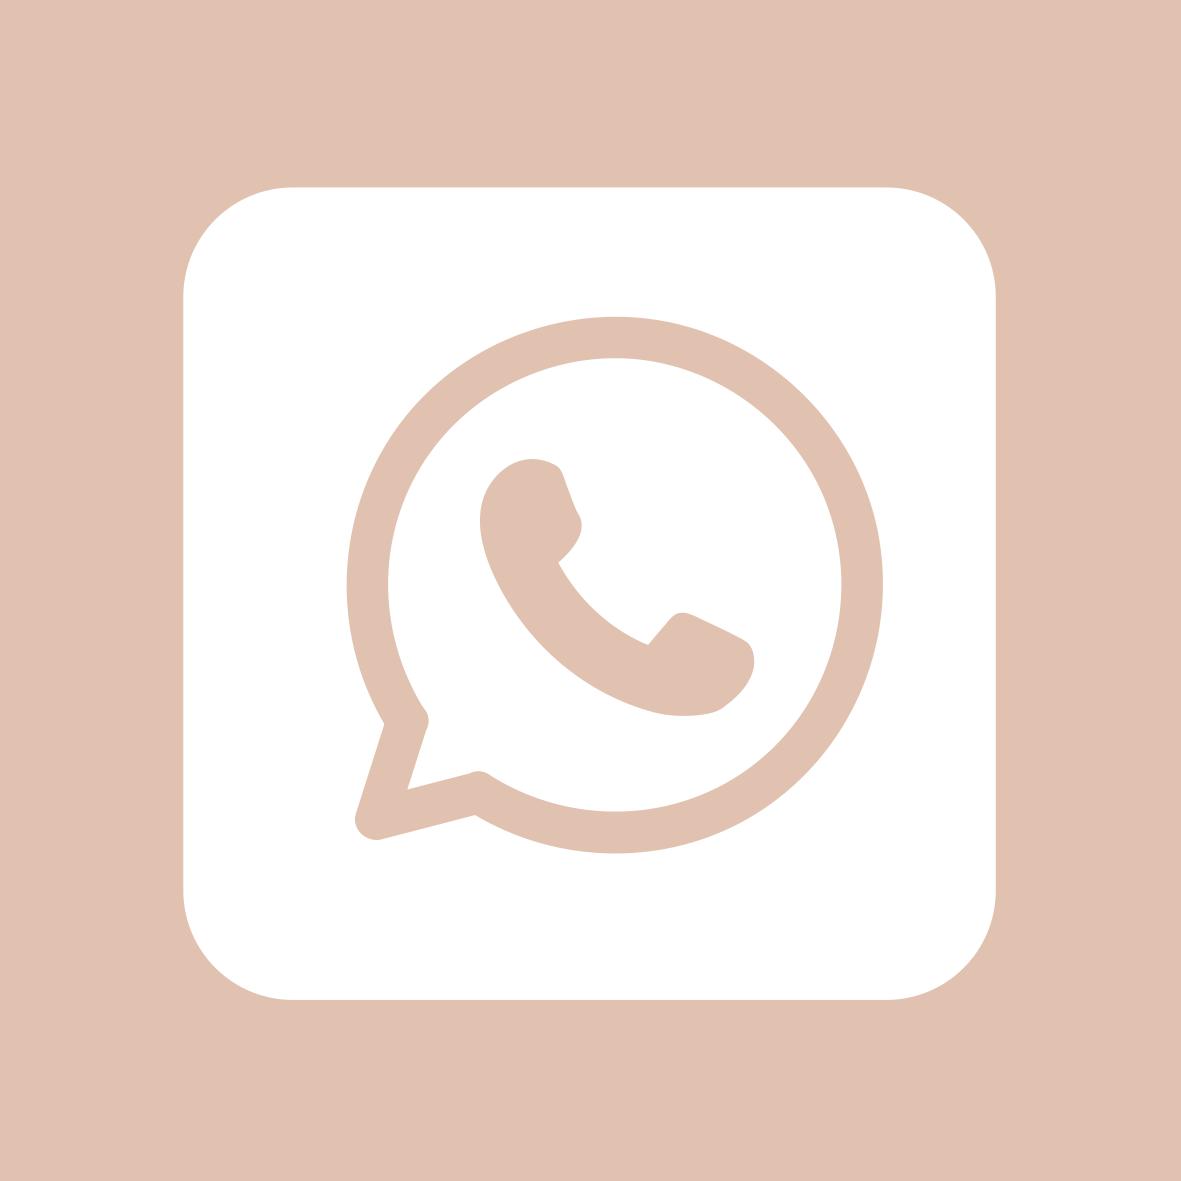 Byanneart Shop Redbubble Iphone Icon App Icon App Icon Design